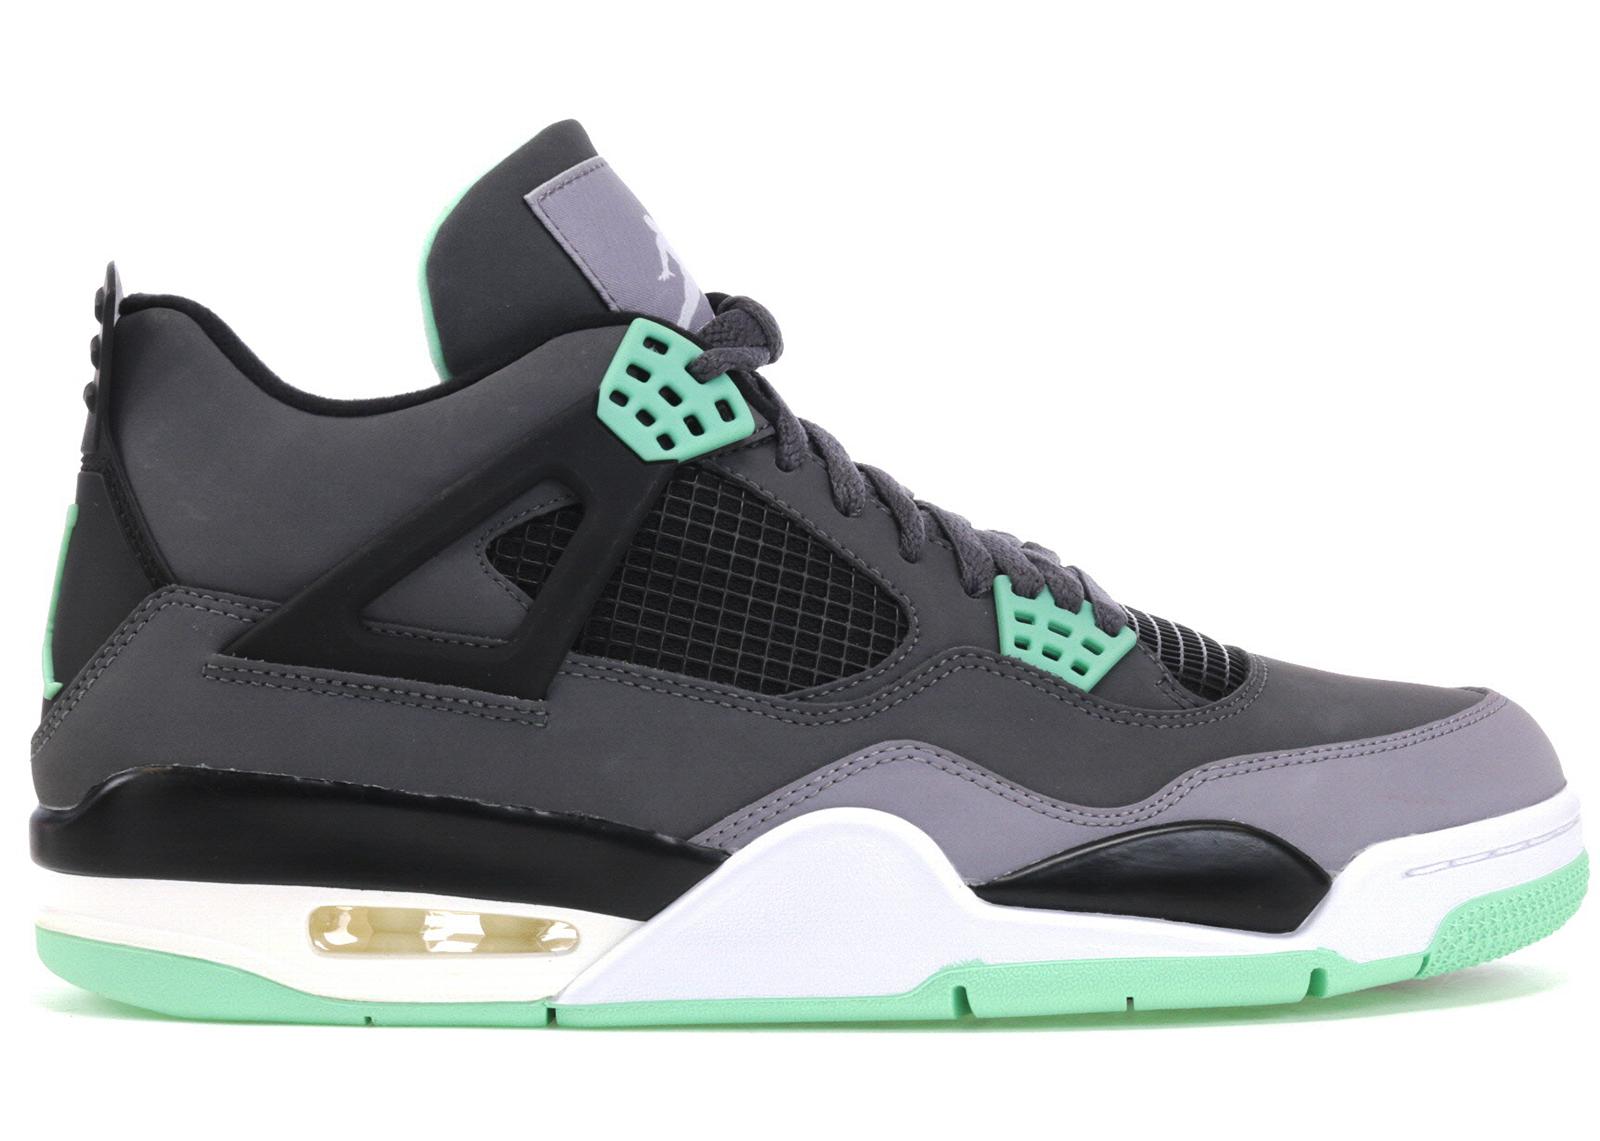 Jordan 4 Retro Green Glow - 308497-033